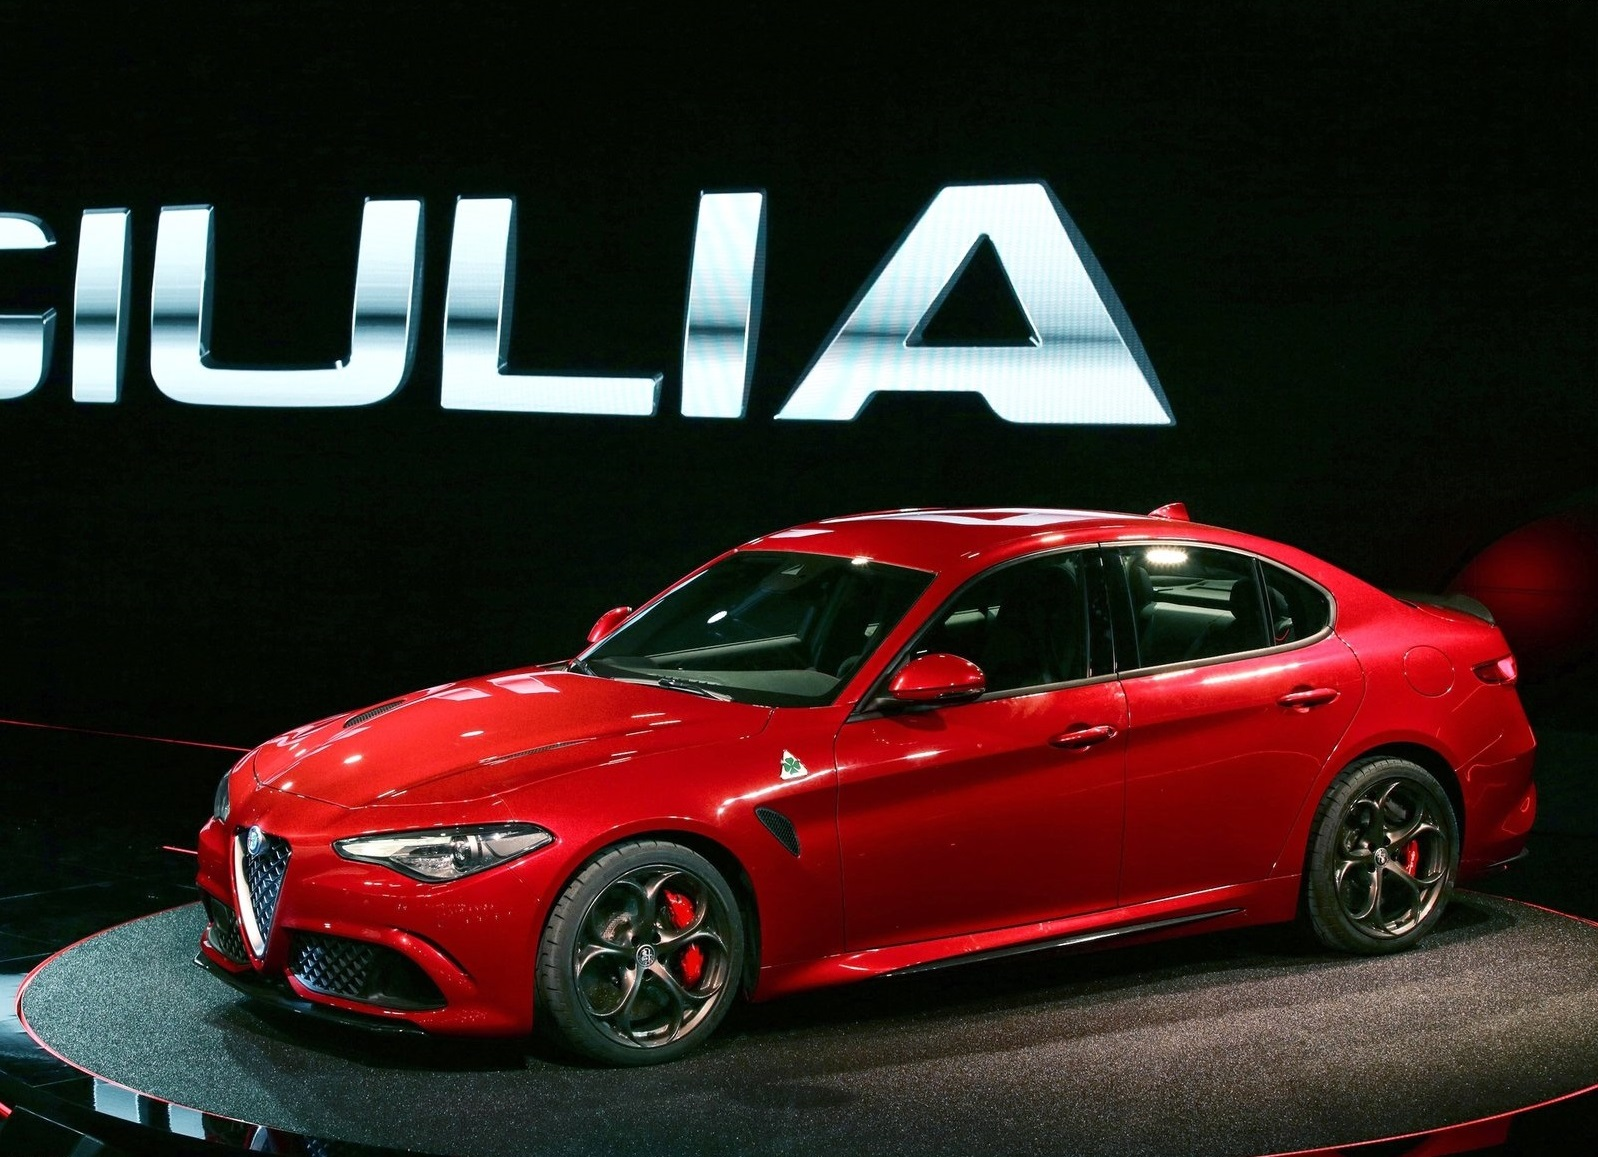 Alfa_Romeo-Giulia_2016_1600x1200_wallpaper_10